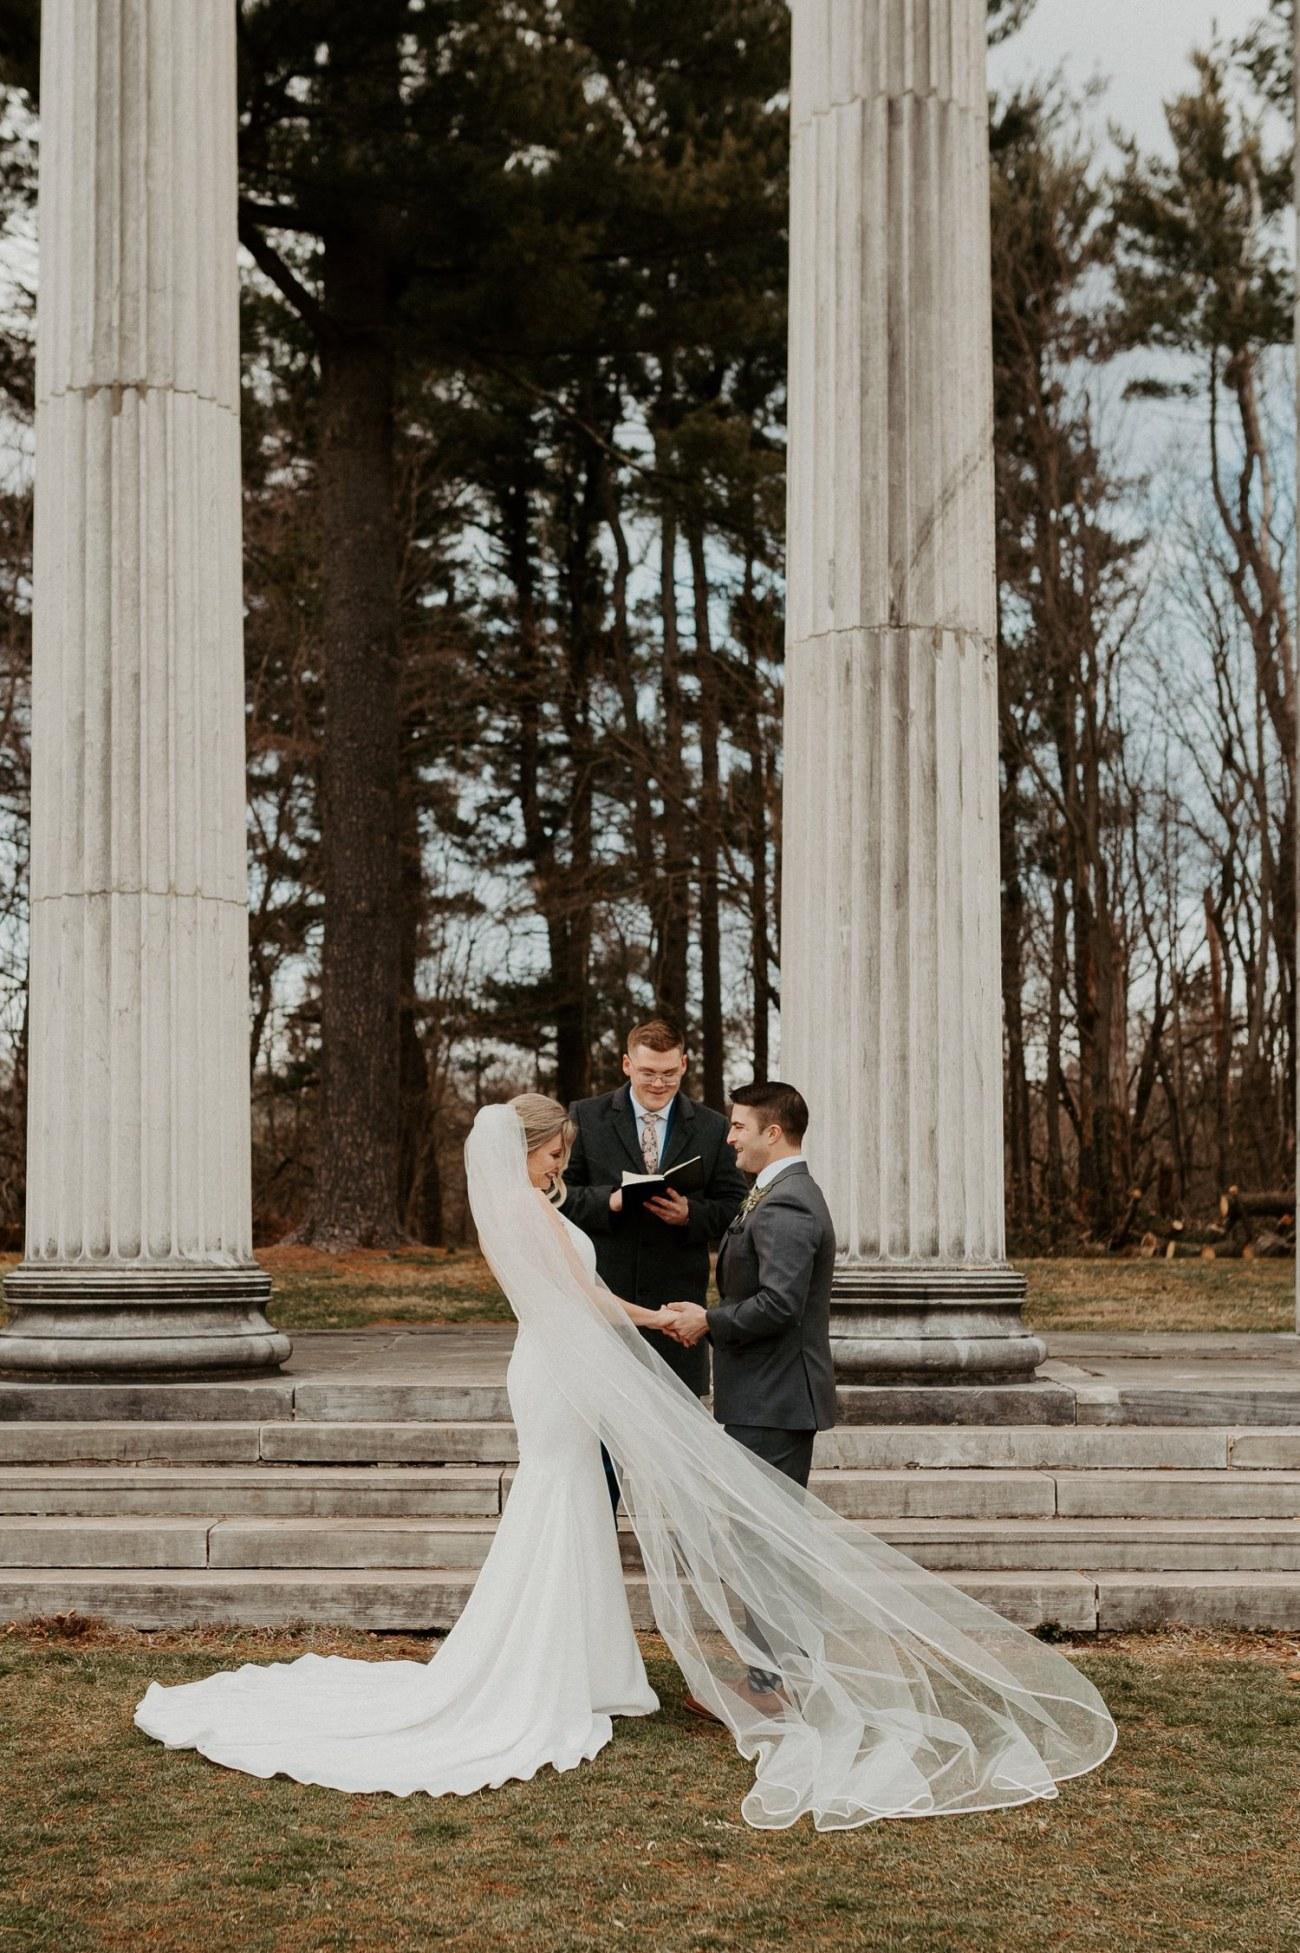 Princeton Battlefield Wedding Princeton University Elopement New Jersey Wedding Photographer Anais Possamai Photography 13